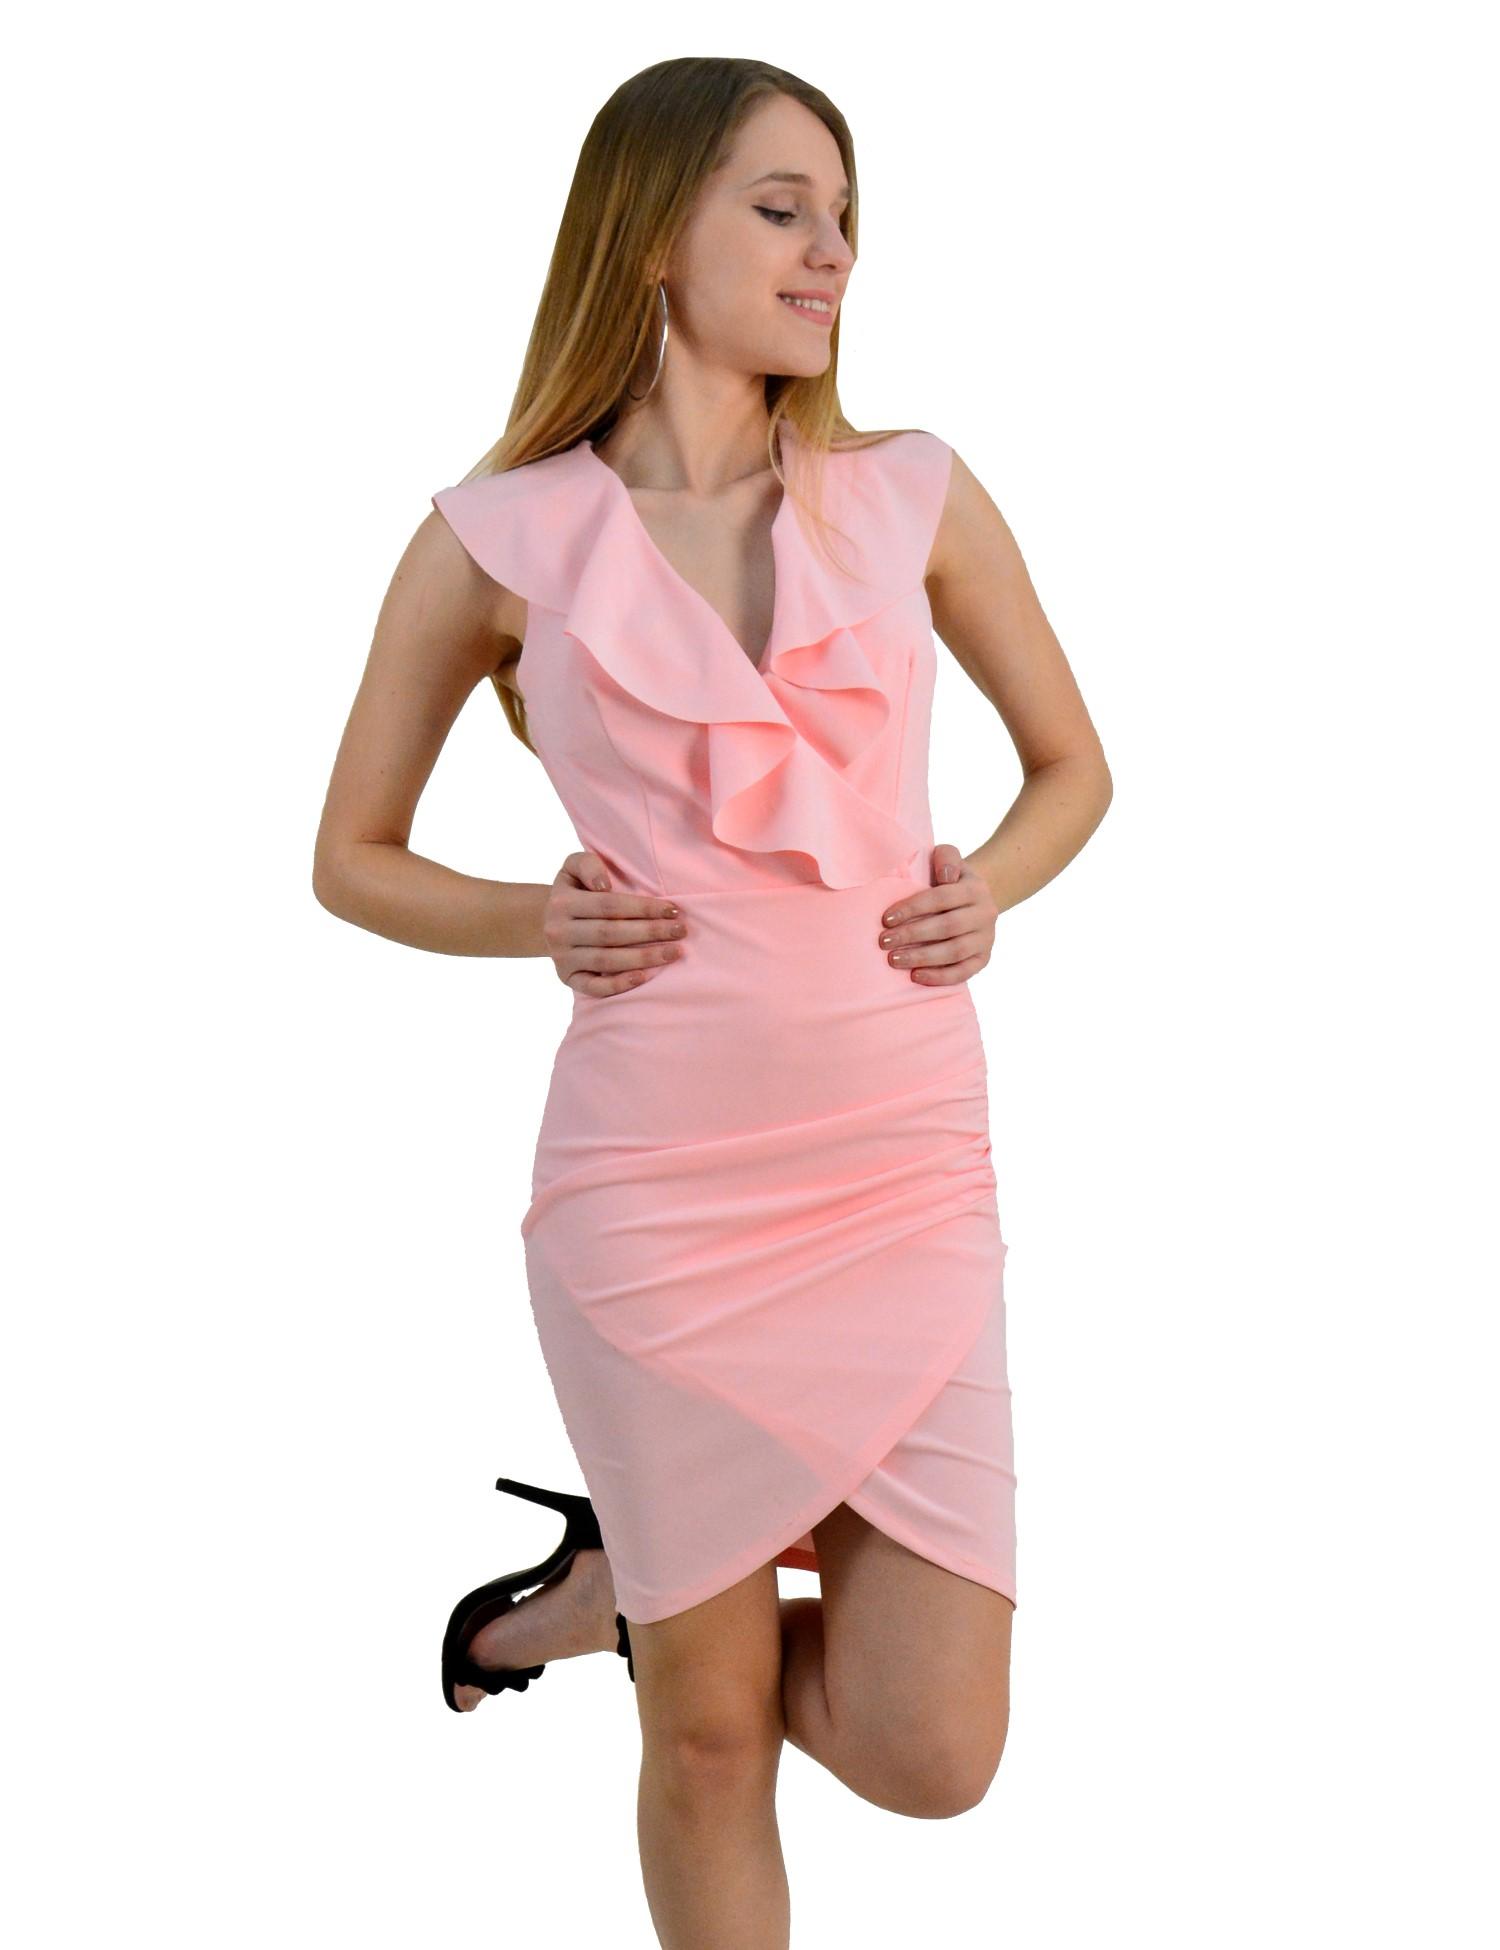 91dcdbc16b9c Outlet Γυναικείο αμάνικο φόρεμα ντραπέ με βολάν ροζ 20078R - Glami.gr